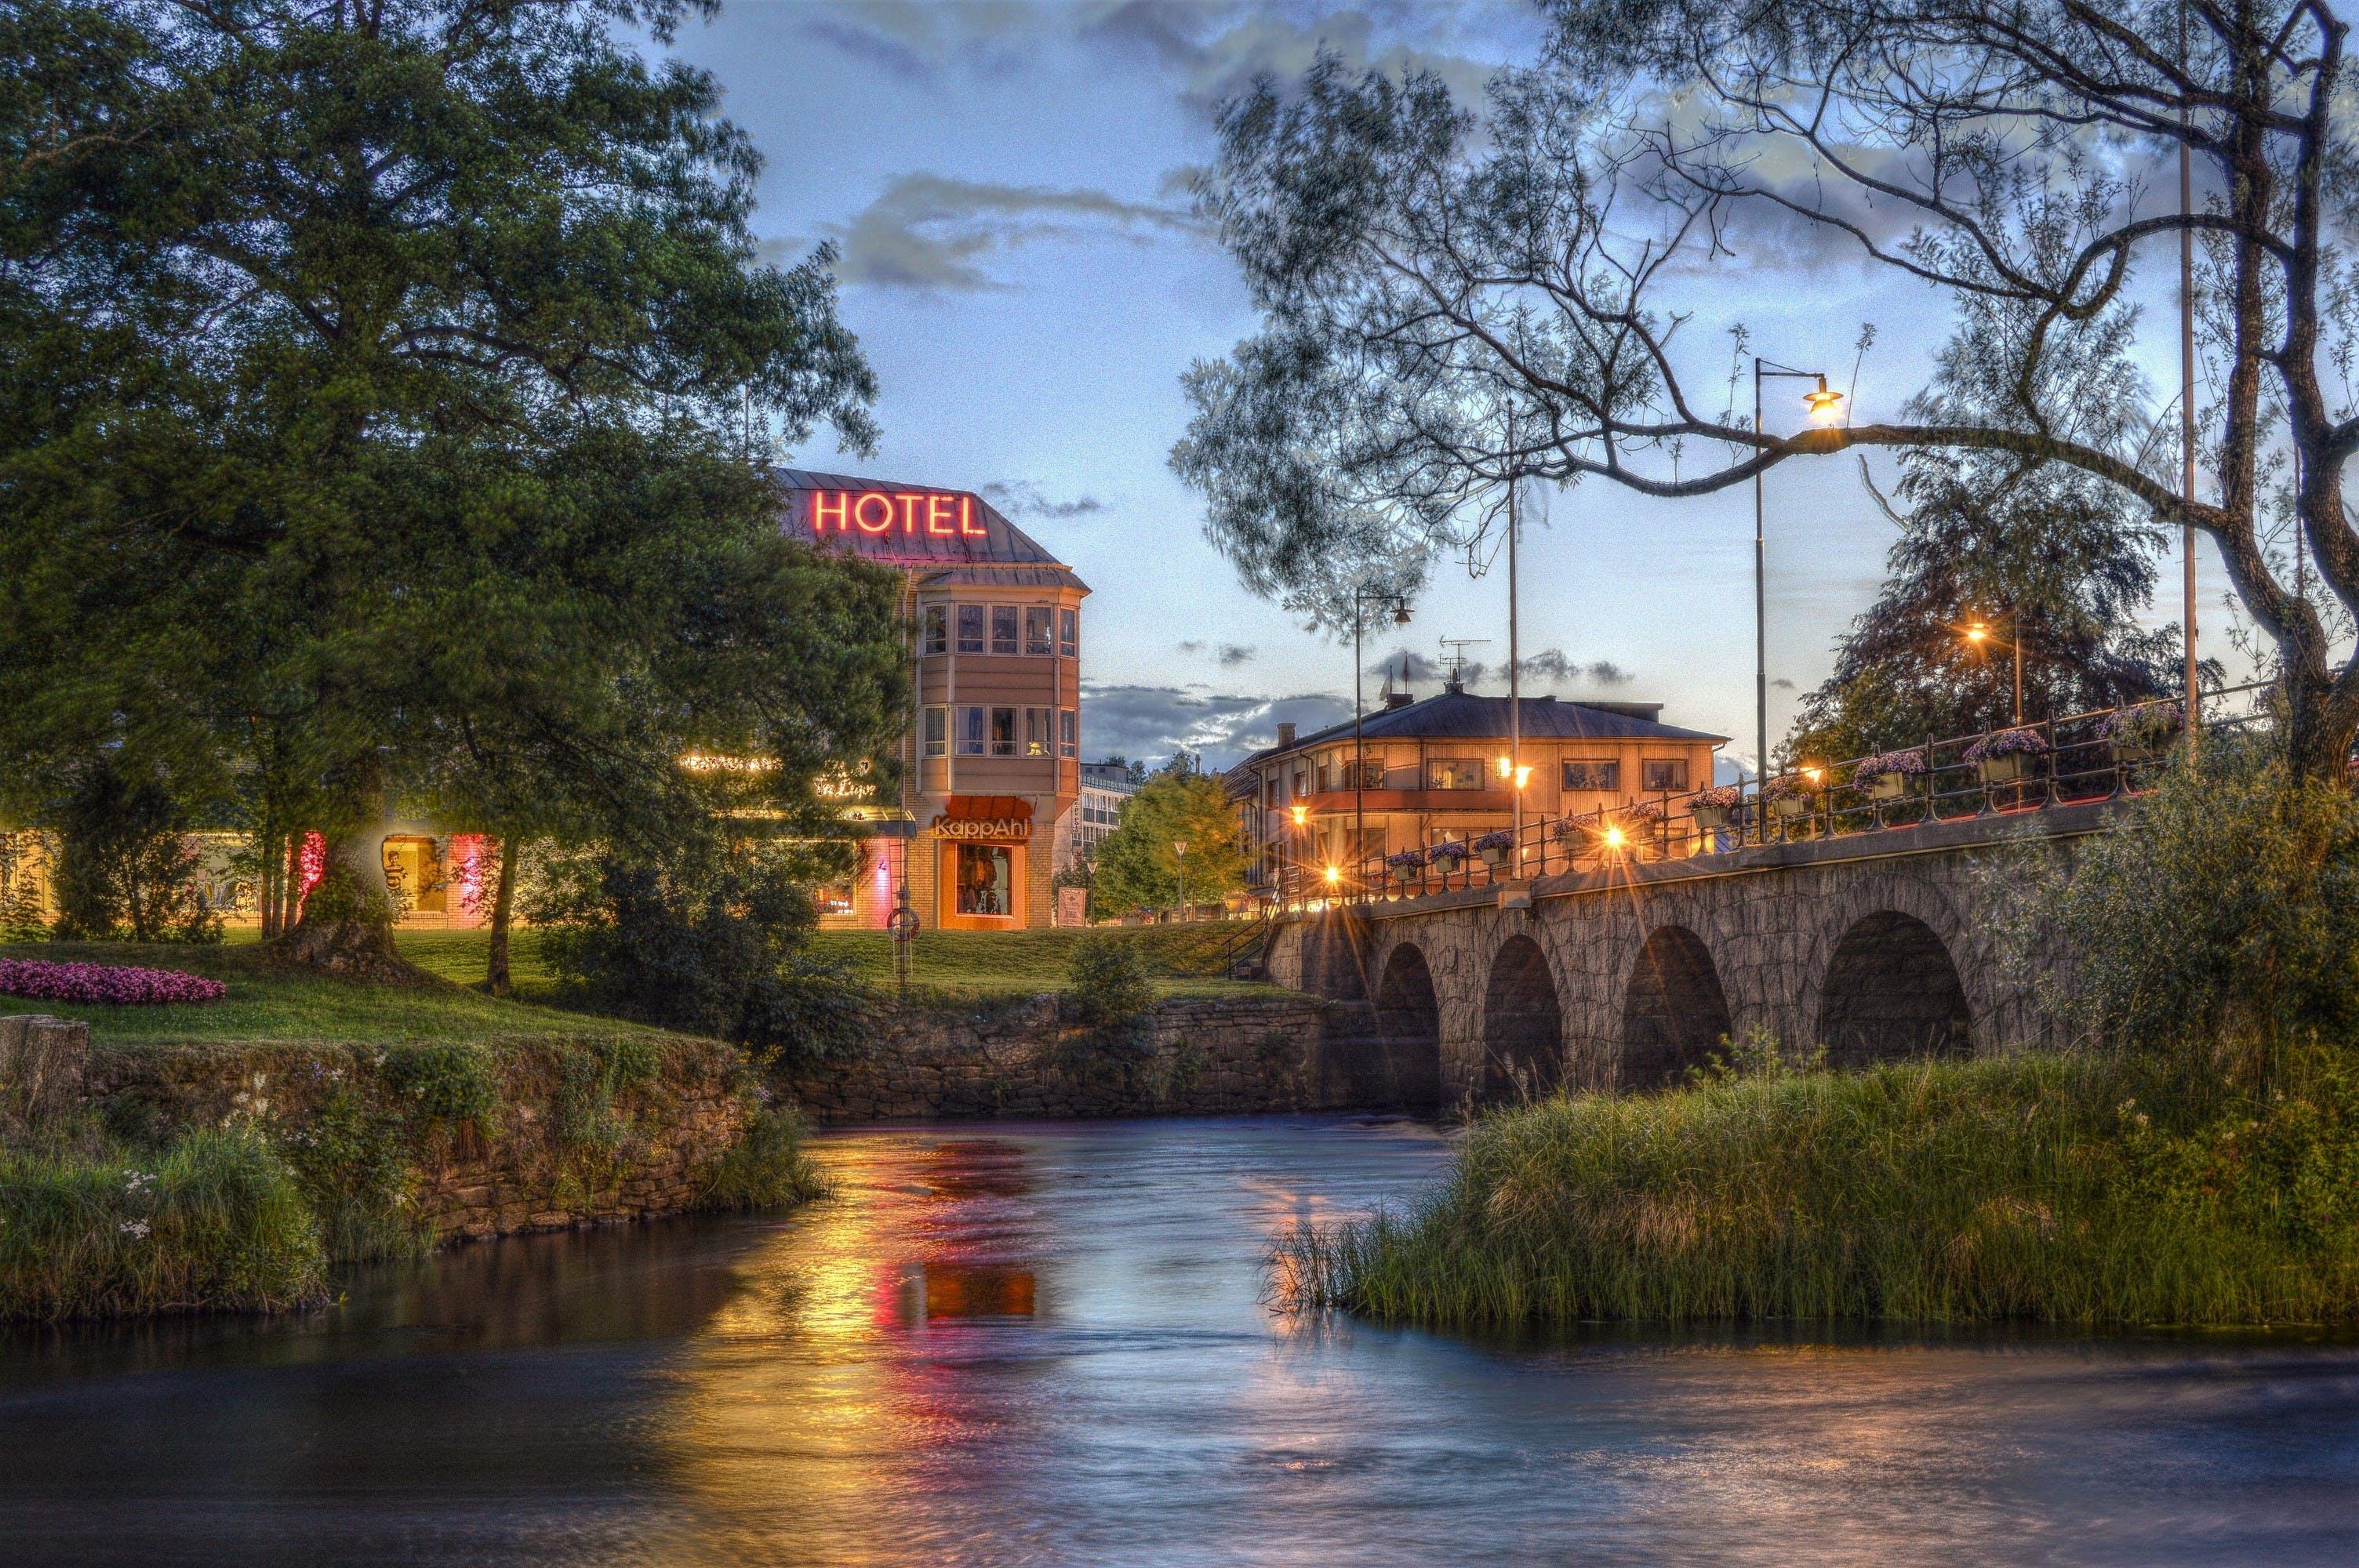 River Near Bridge Beside Hotel